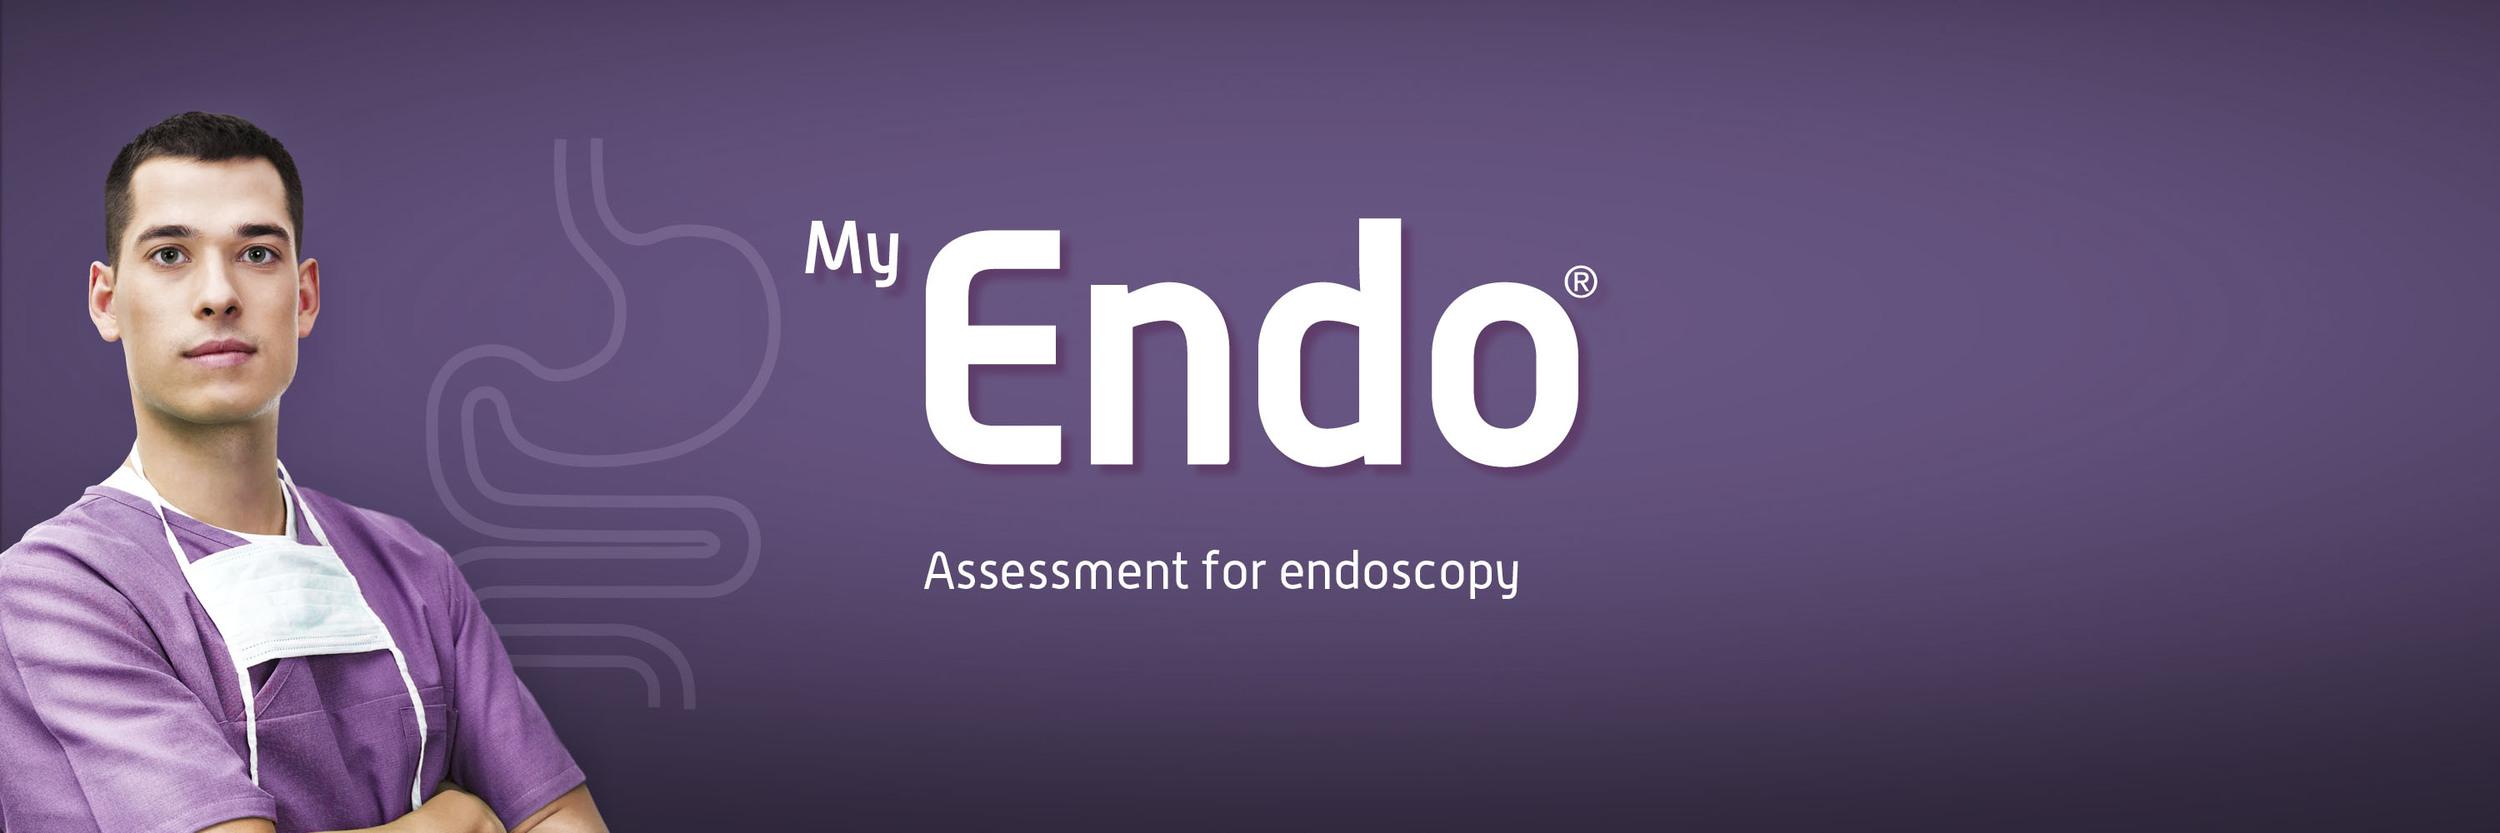 MyEndo, pre-procedural assessment for endoscopies